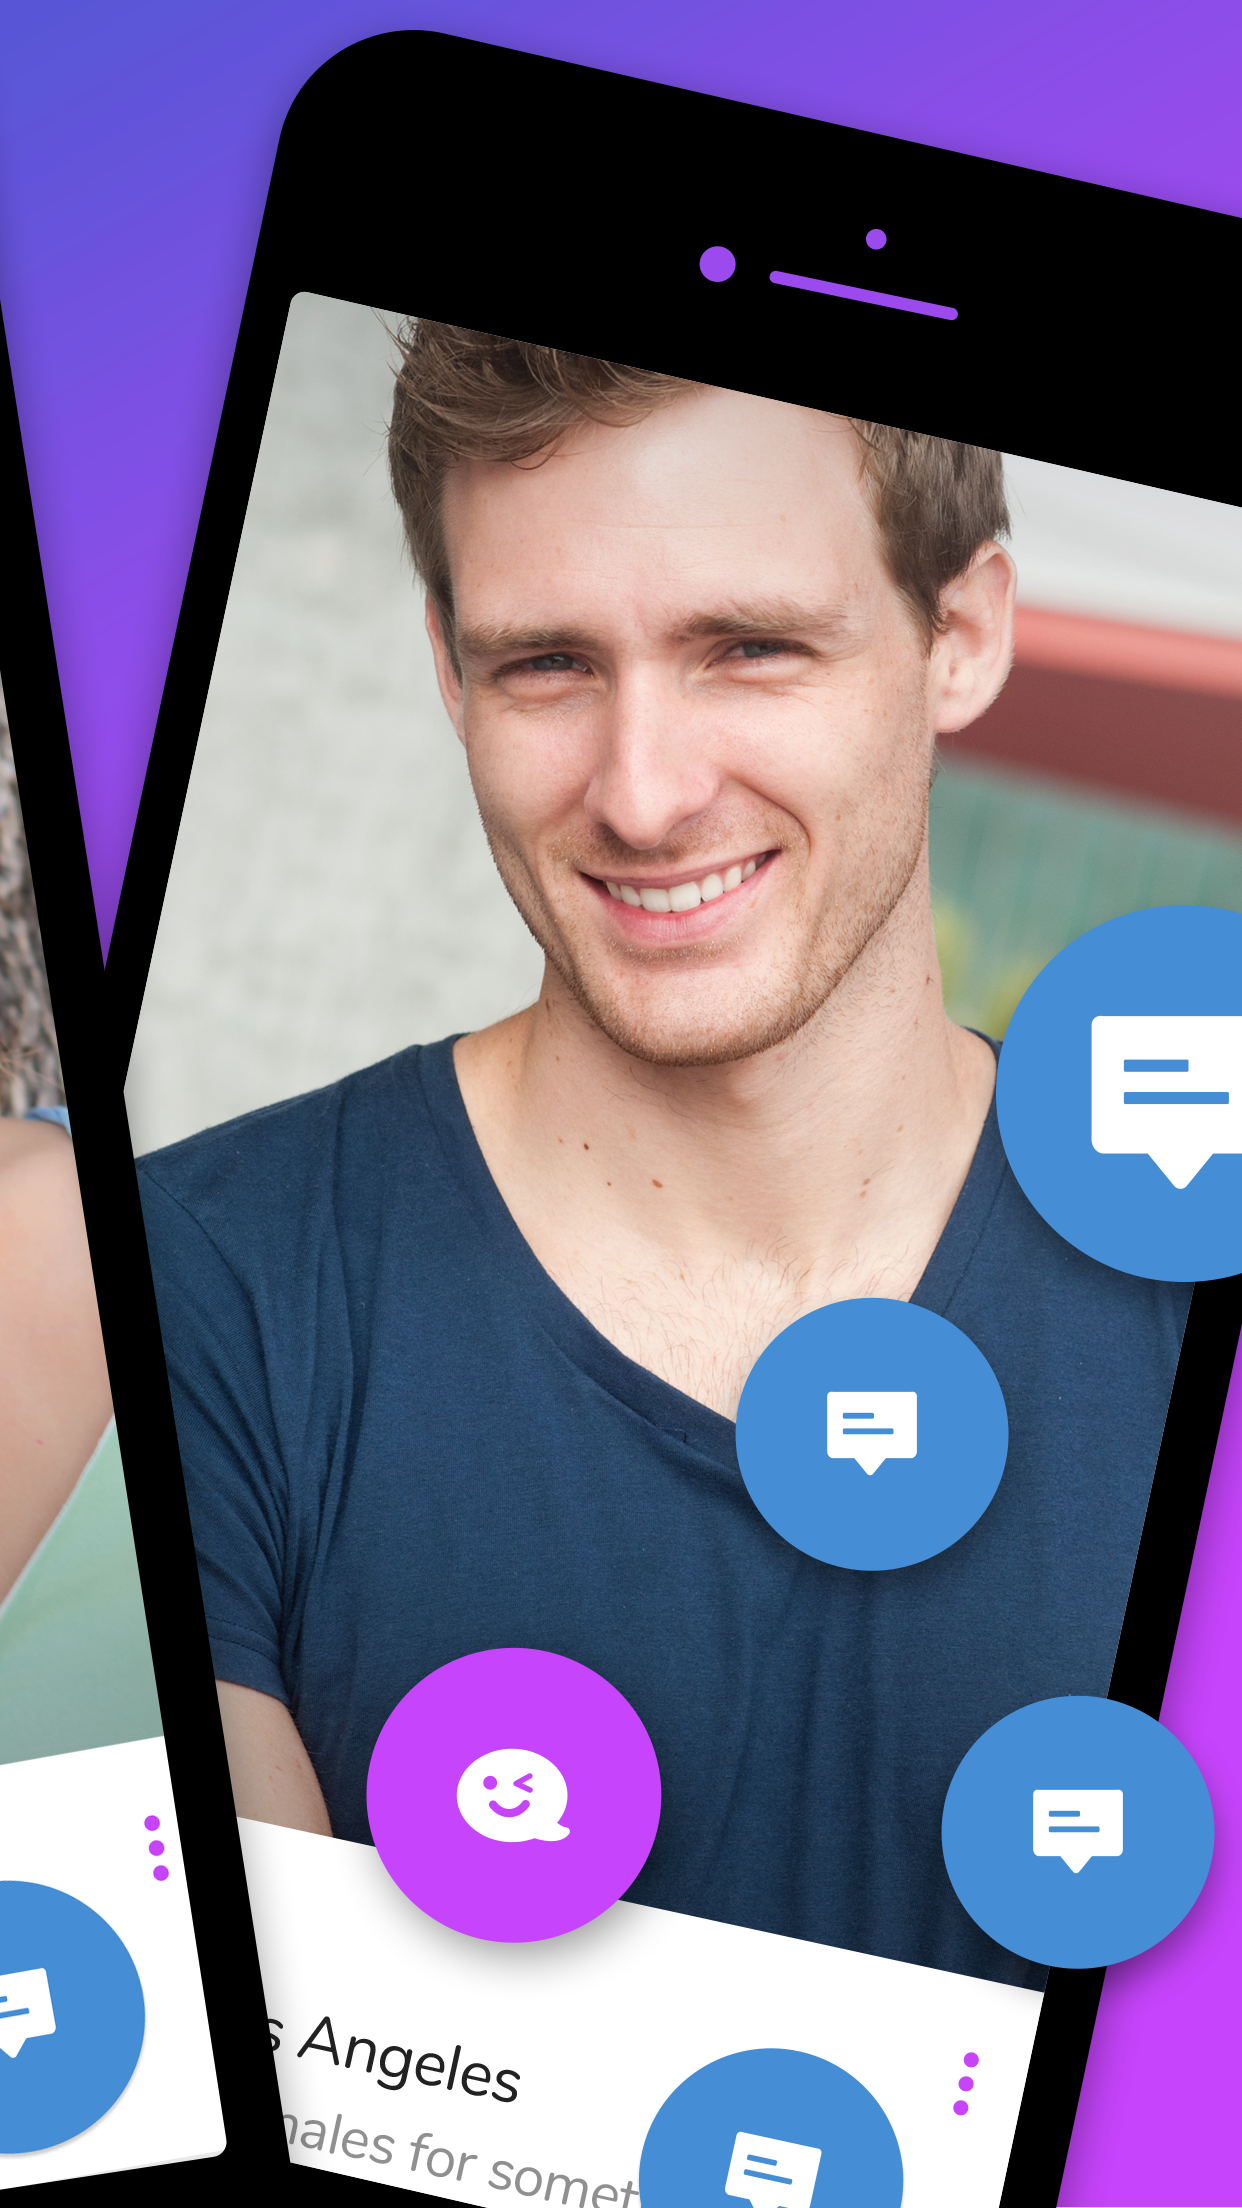 HUD Hook Up Dating App Screenshot